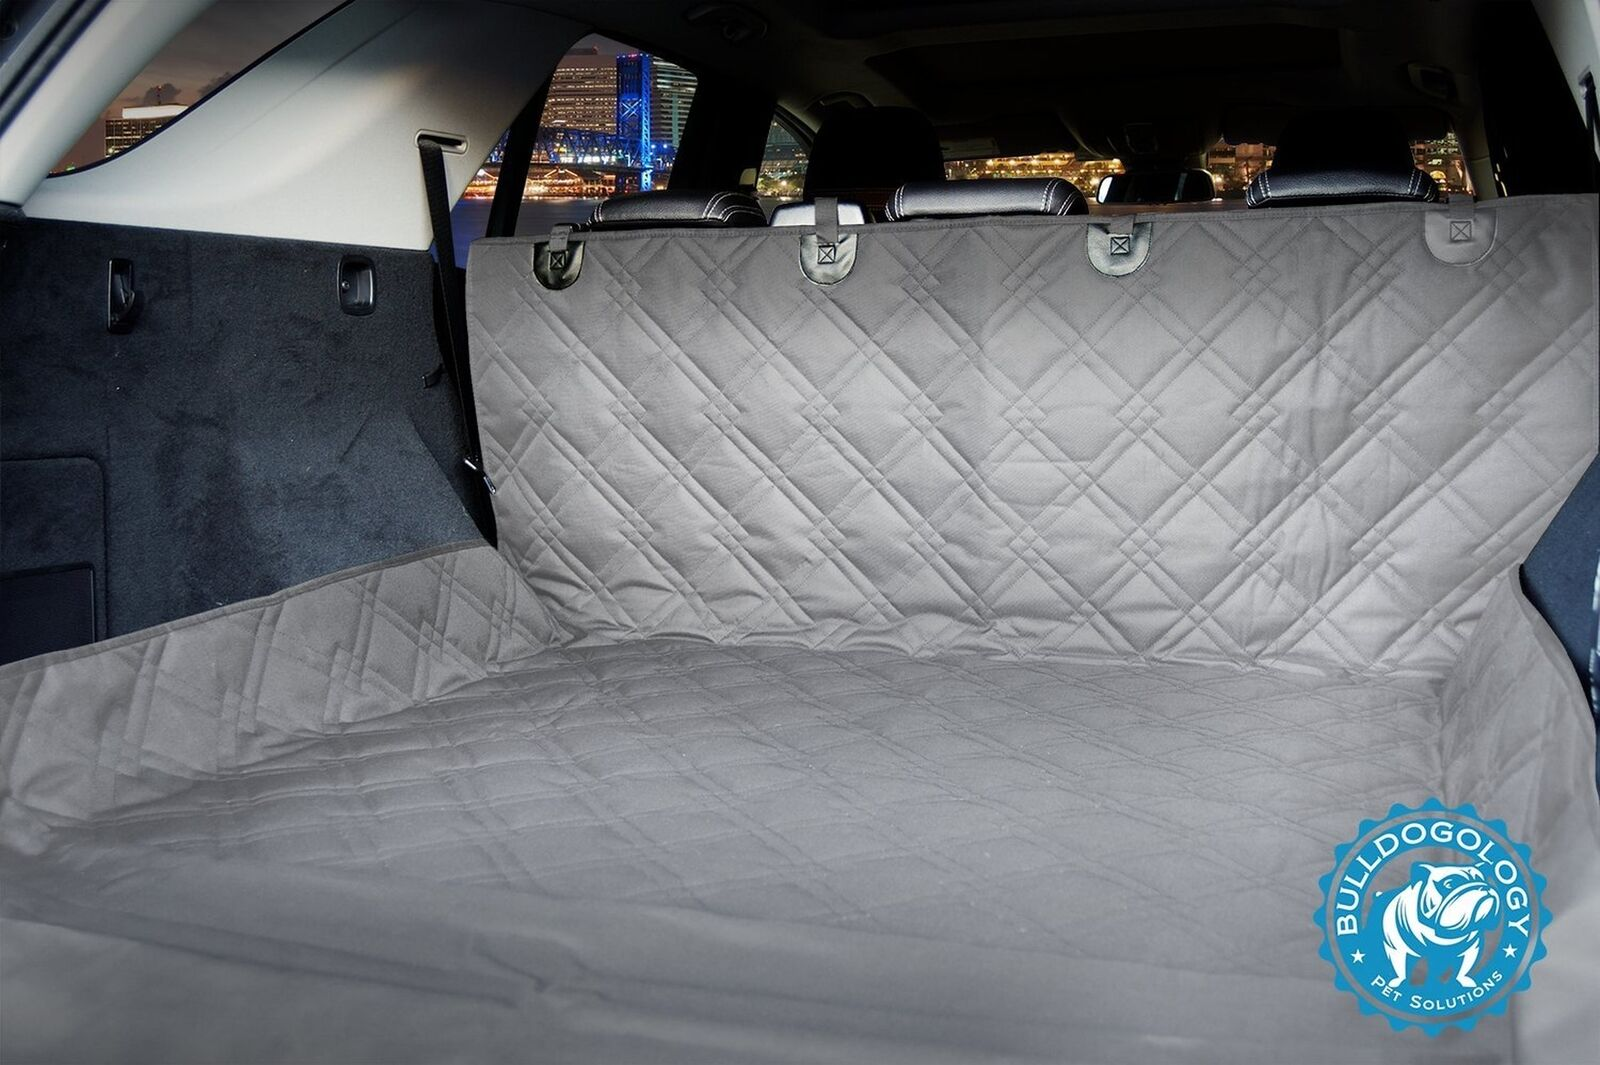 "Bulldogology Heavy Duty Dog Cargo Liner Covers for All Vehicles 55 x82"" grigio"